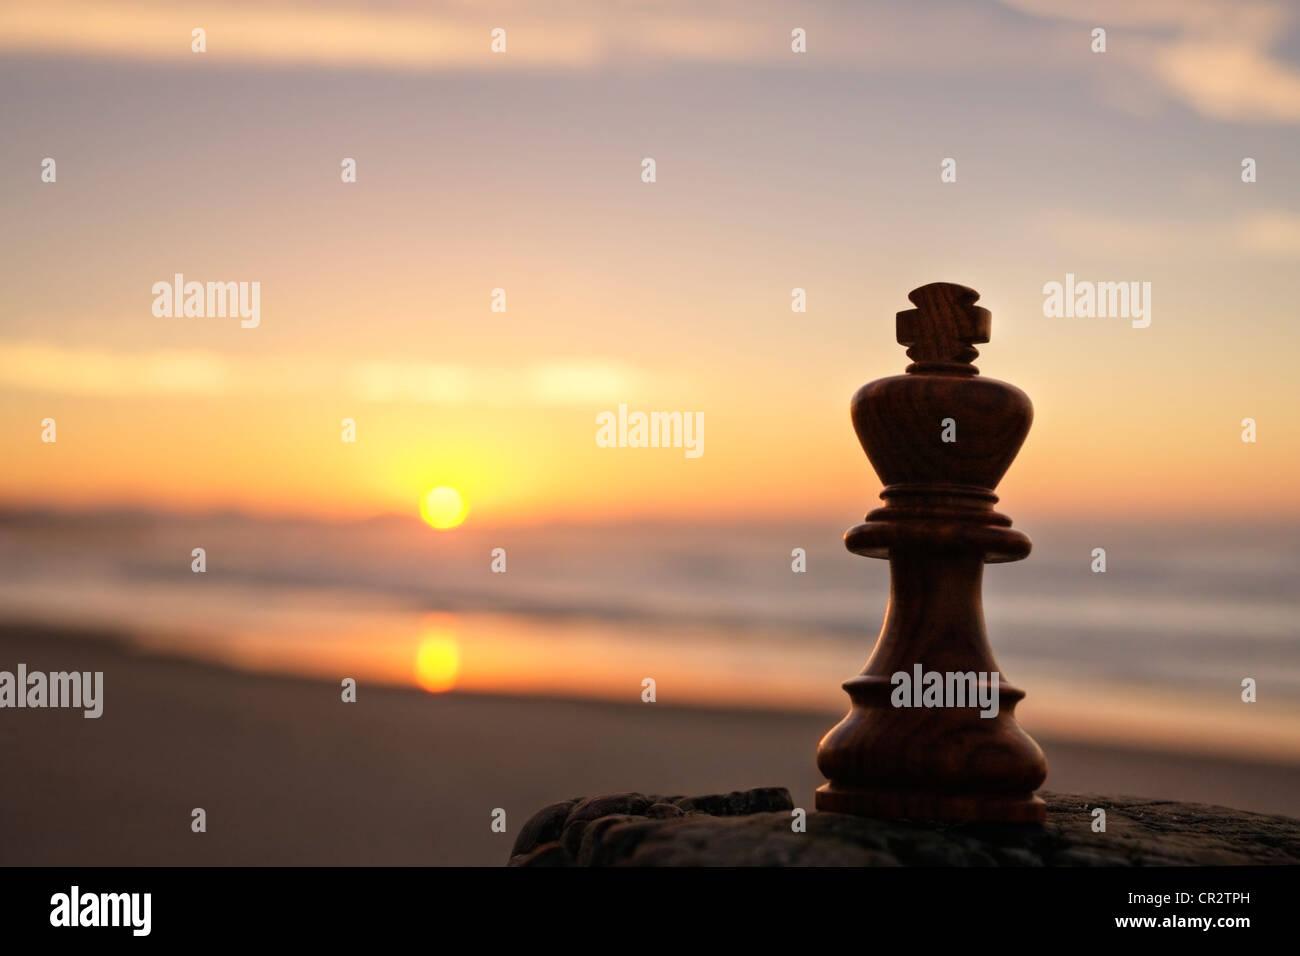 chess king on beach at sunrise - Stock Image